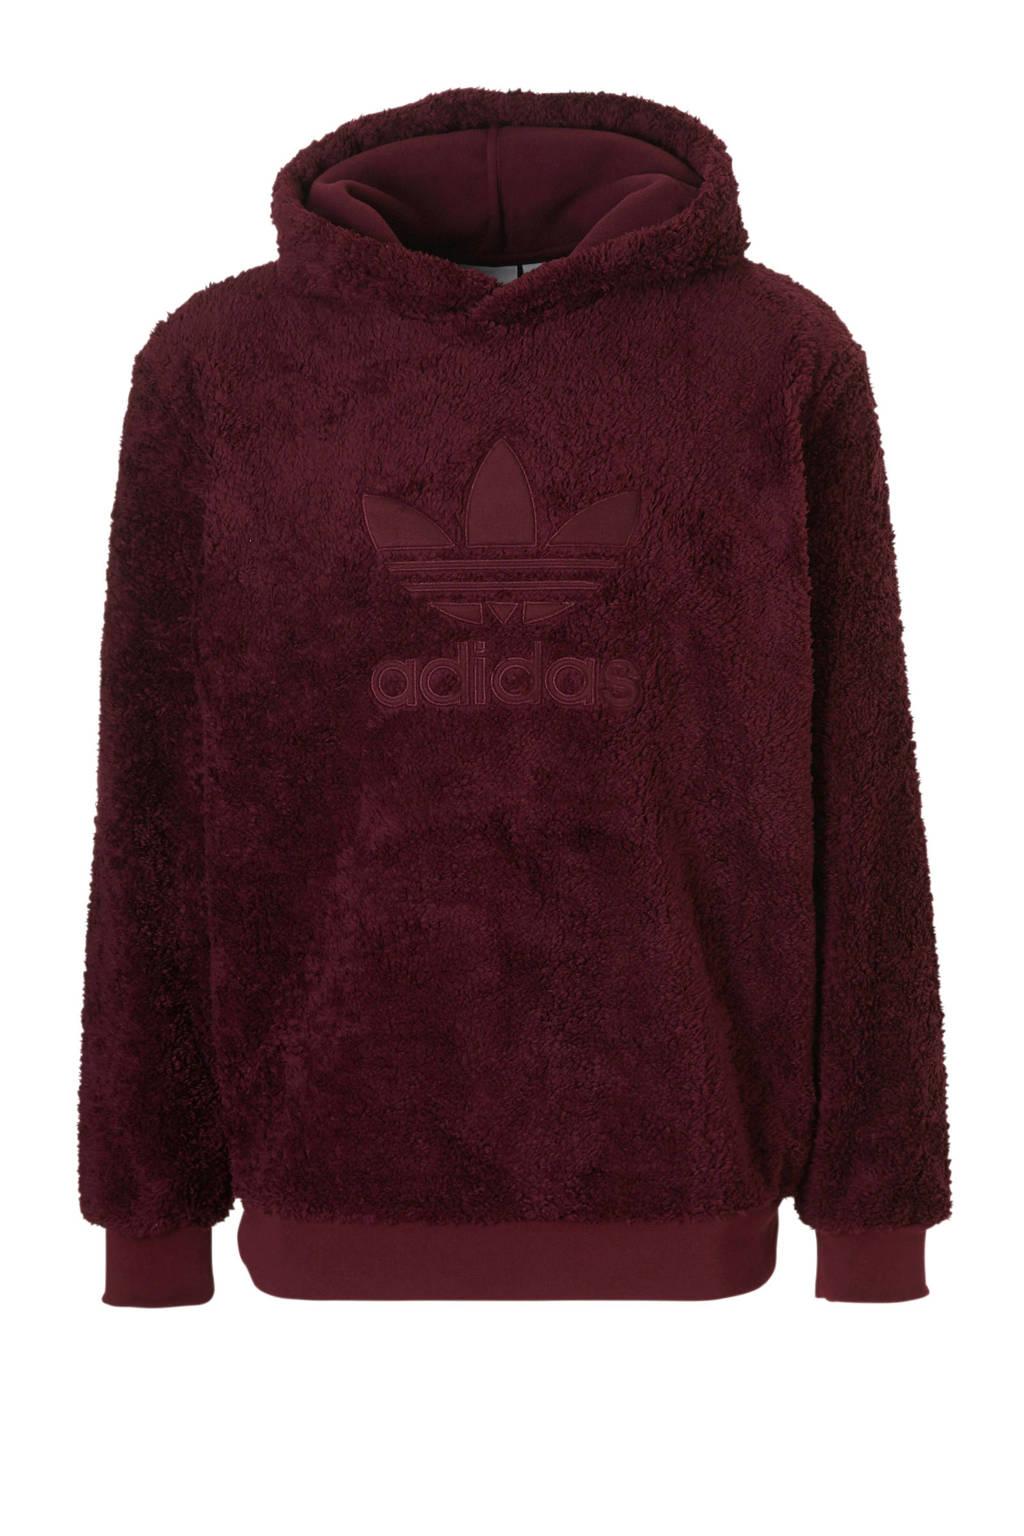 fa6f7efccfe adidas originals hoodie van teddy bordeaux, Bordeauxrood